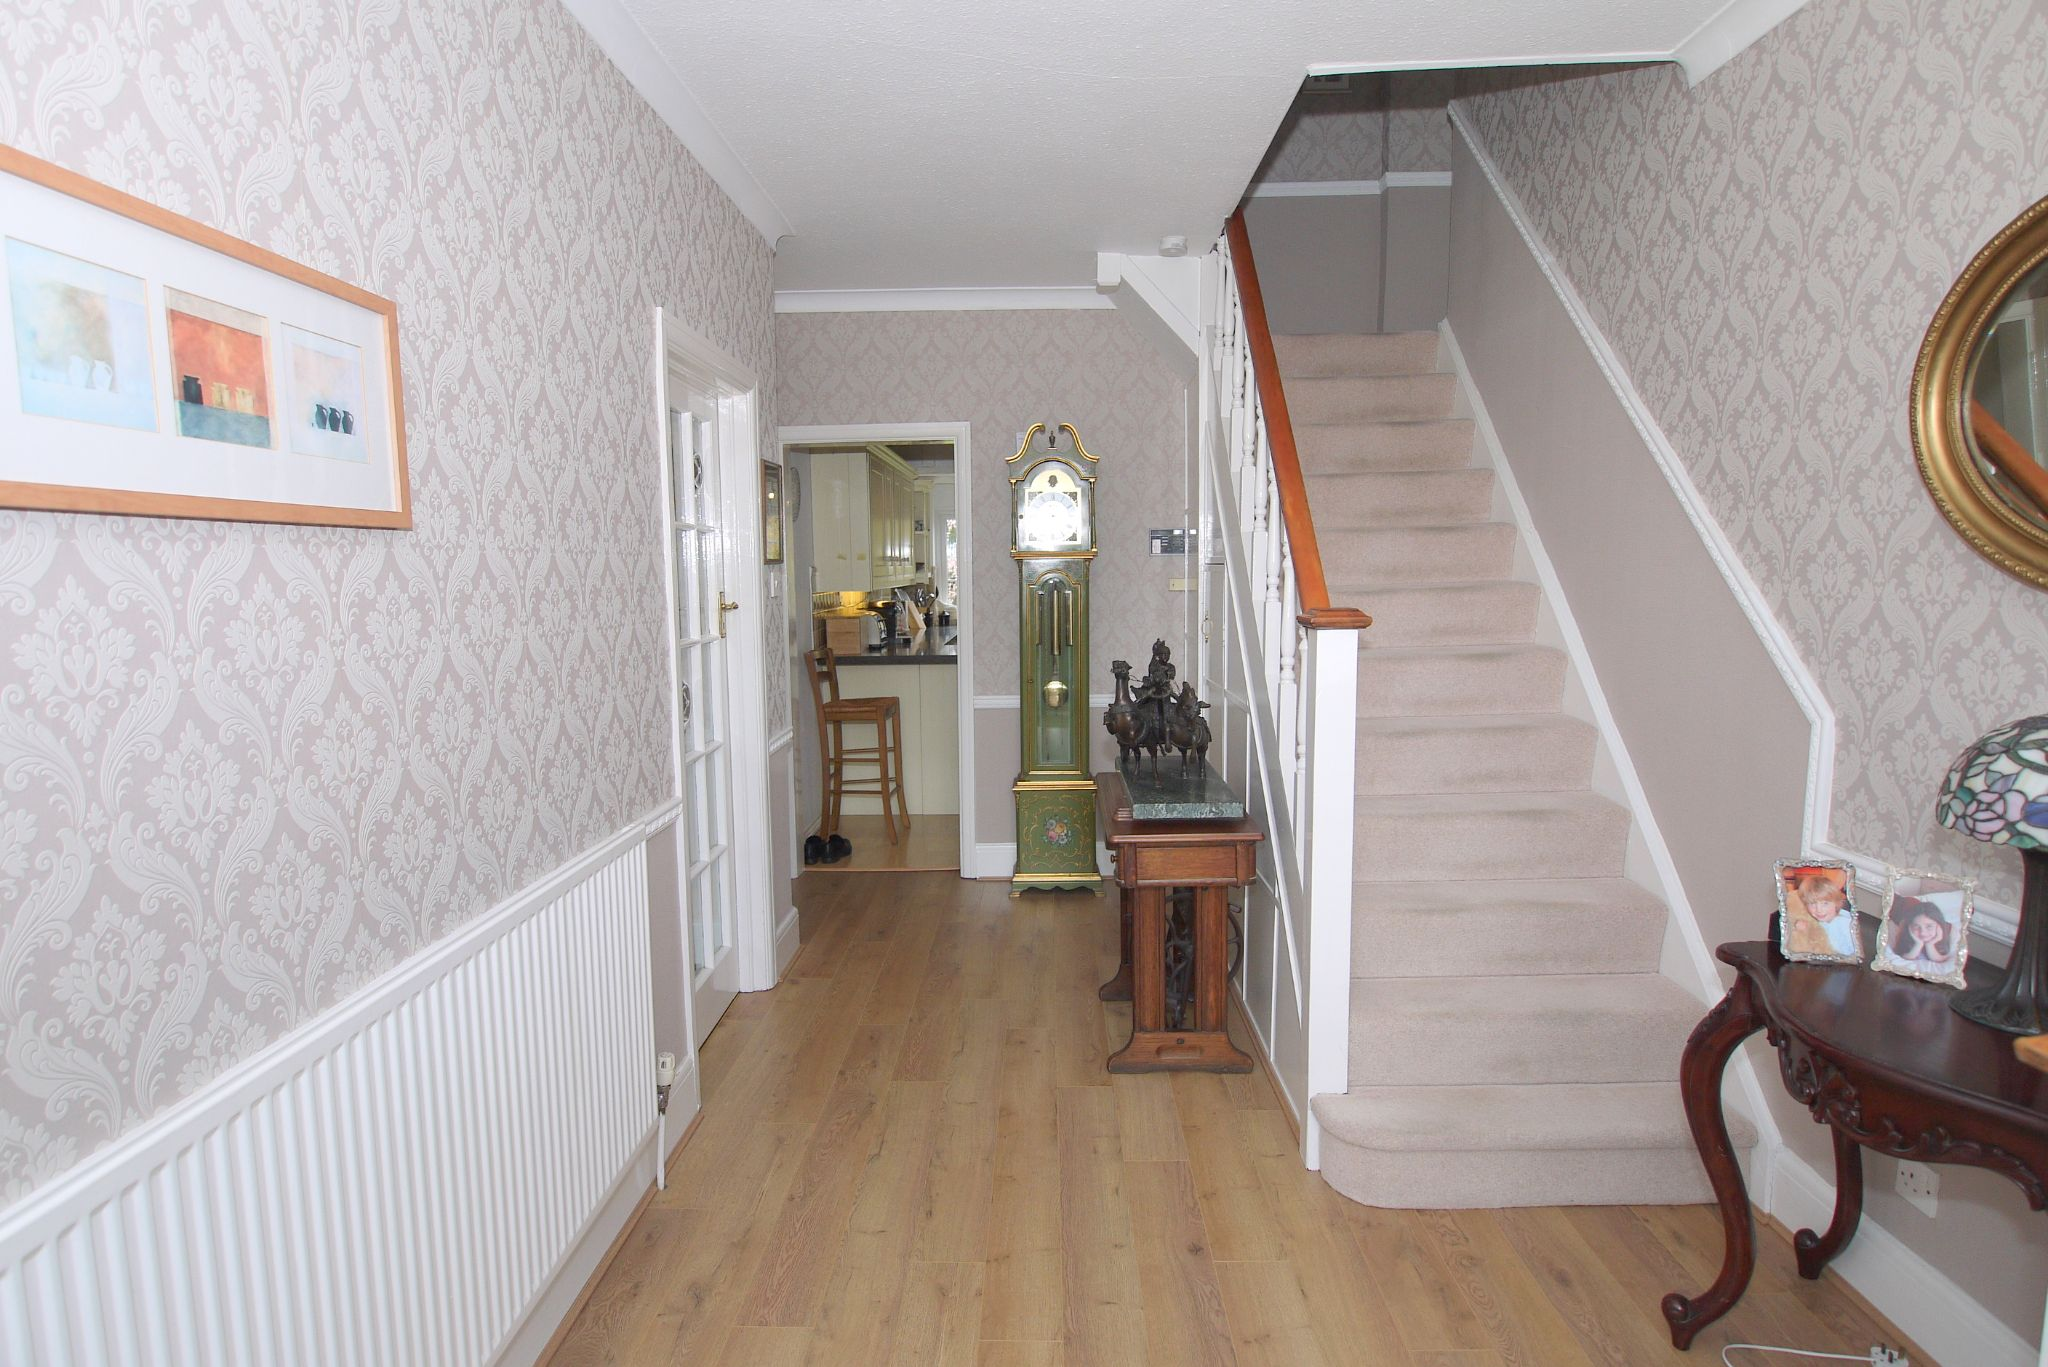 4 bedroom detached house Sold in Sevenoaks - Photograph 7